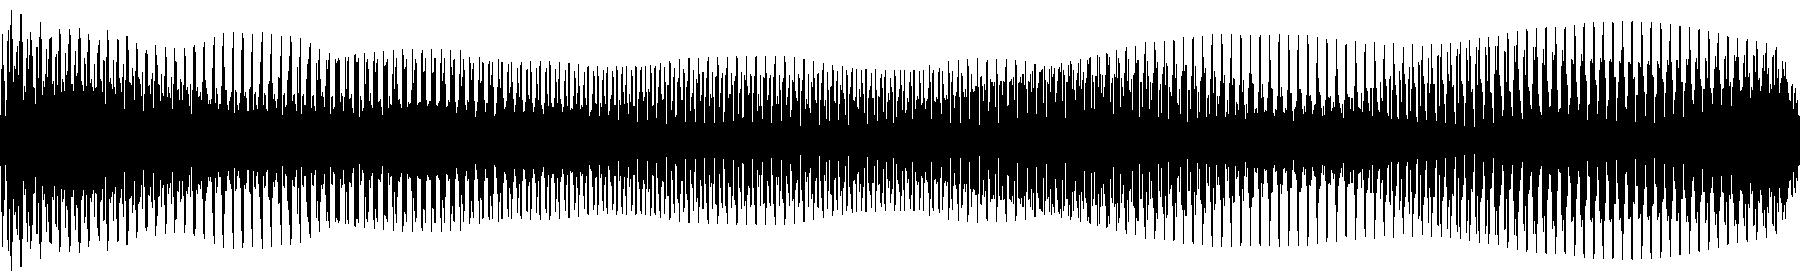 vedh bass cut 078 g